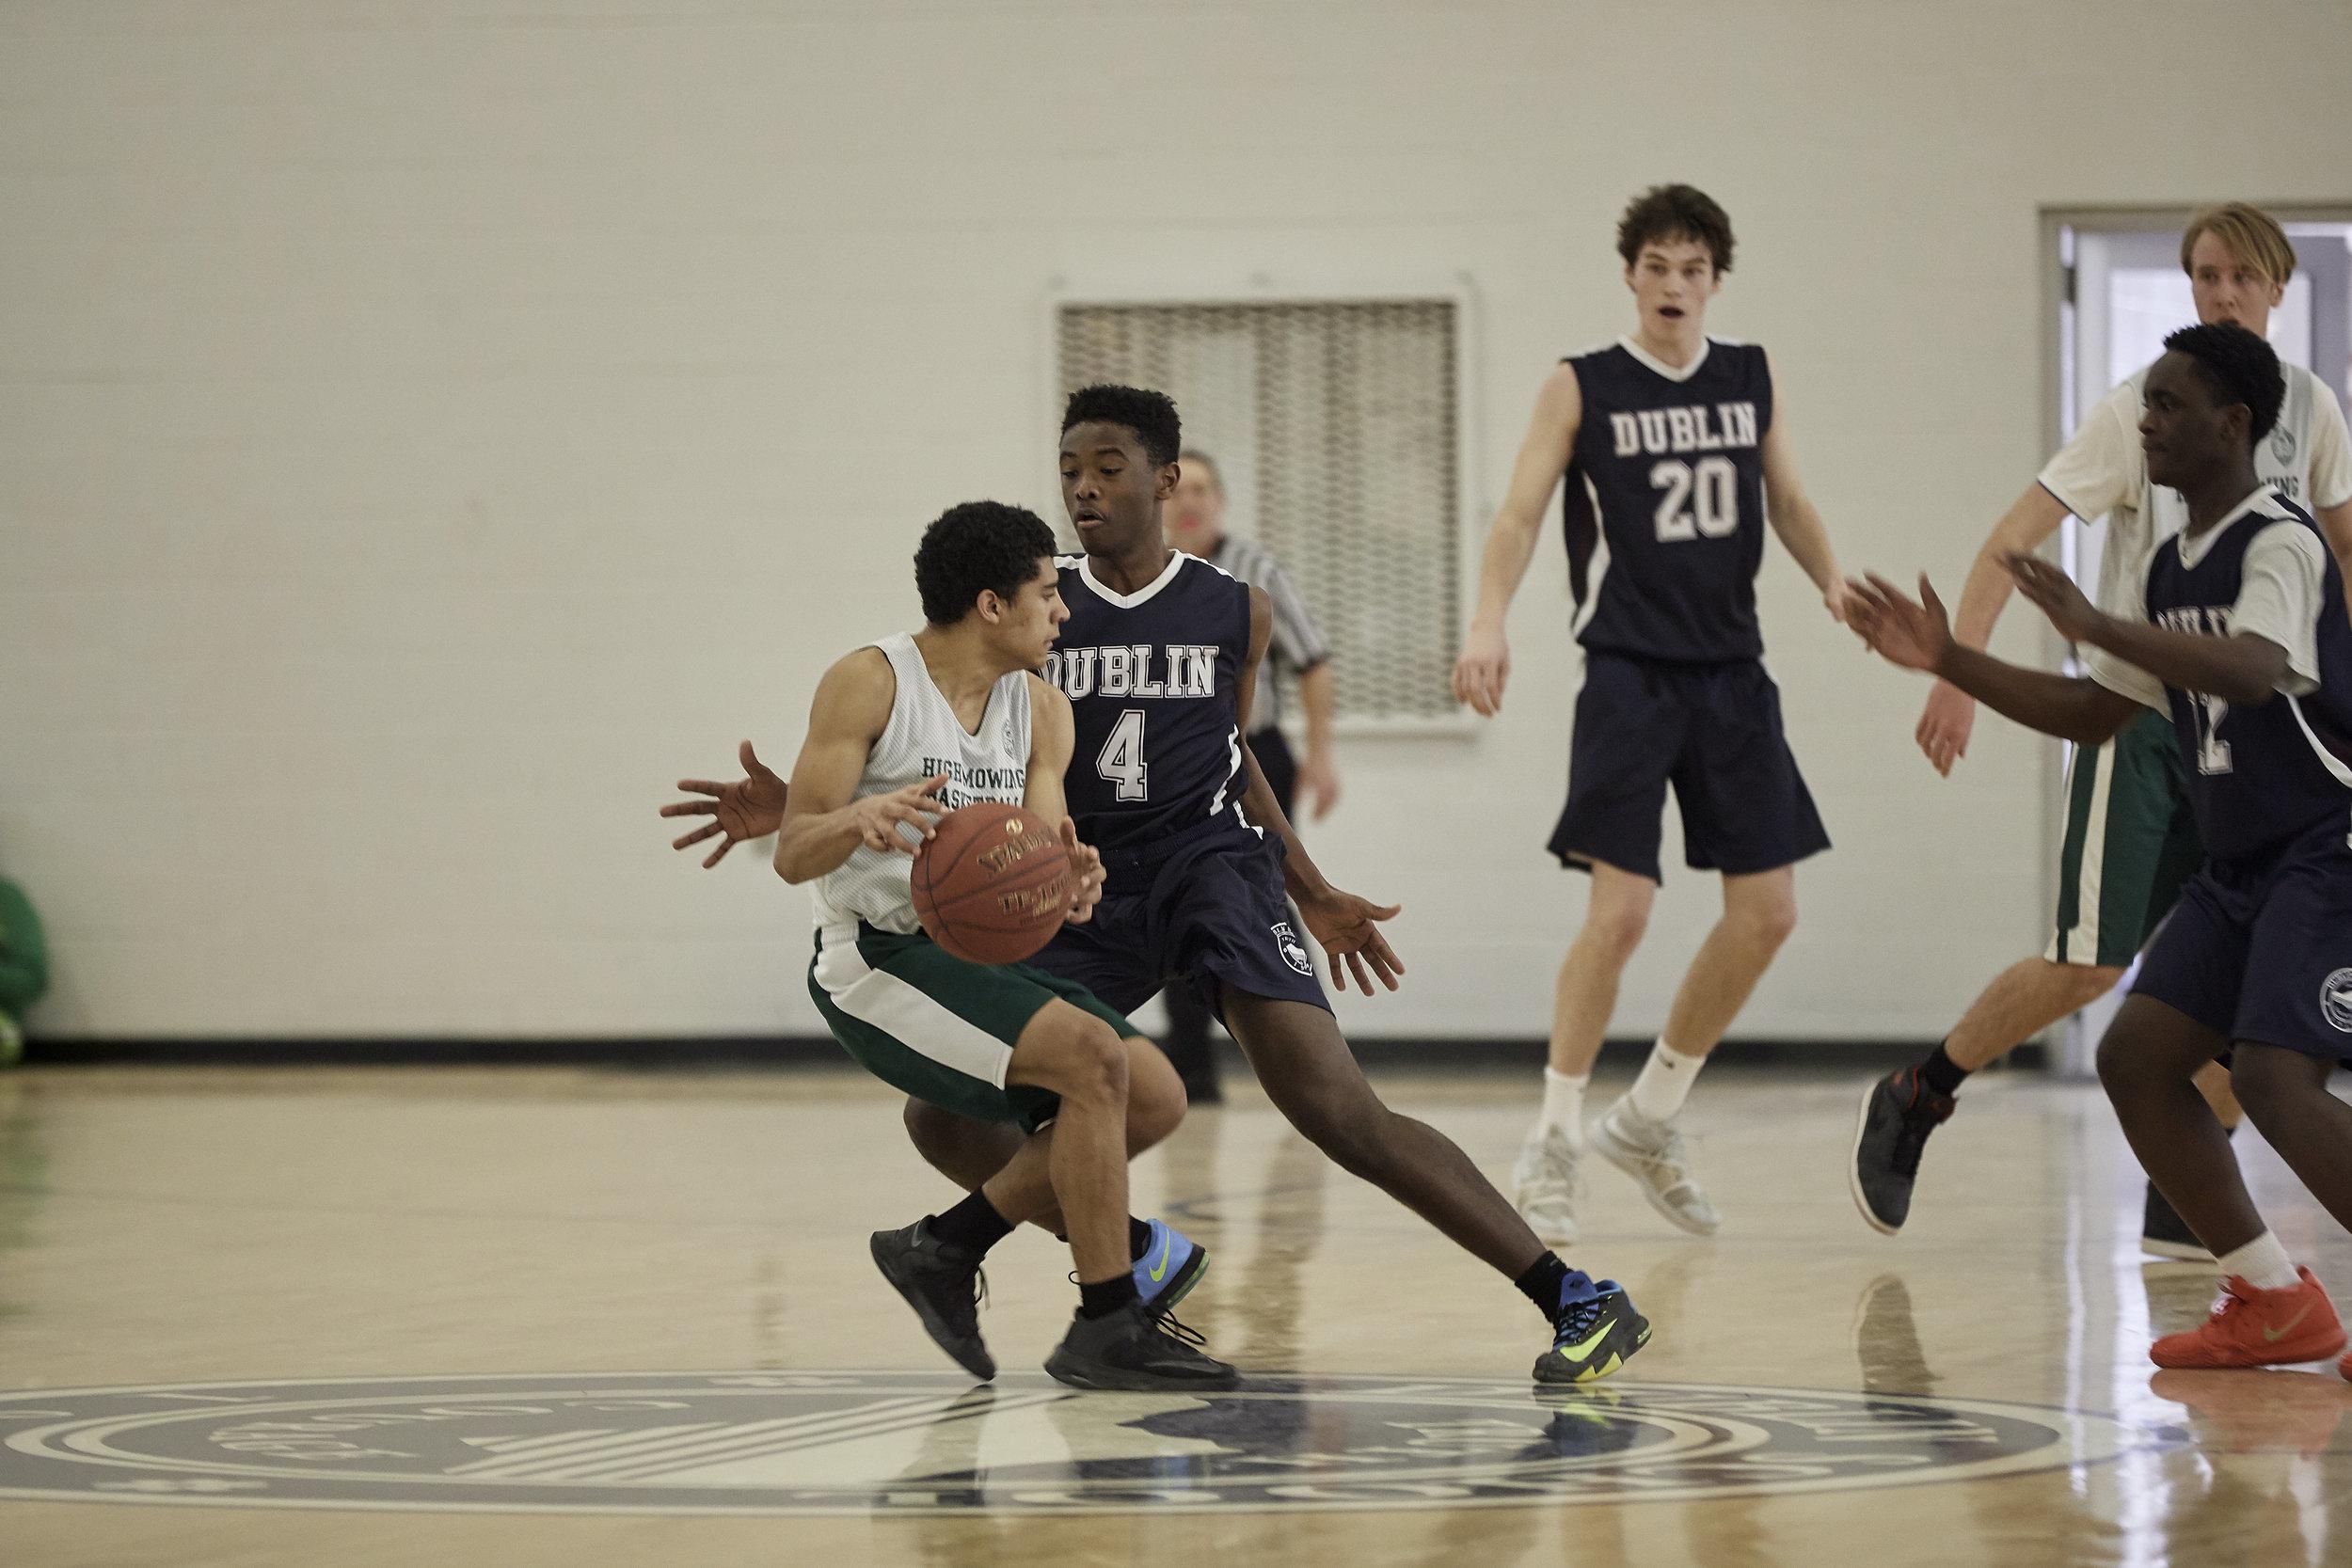 Boys Varsity Basketball vs High Mowing School - Feb 02 2019 - 0083.jpg